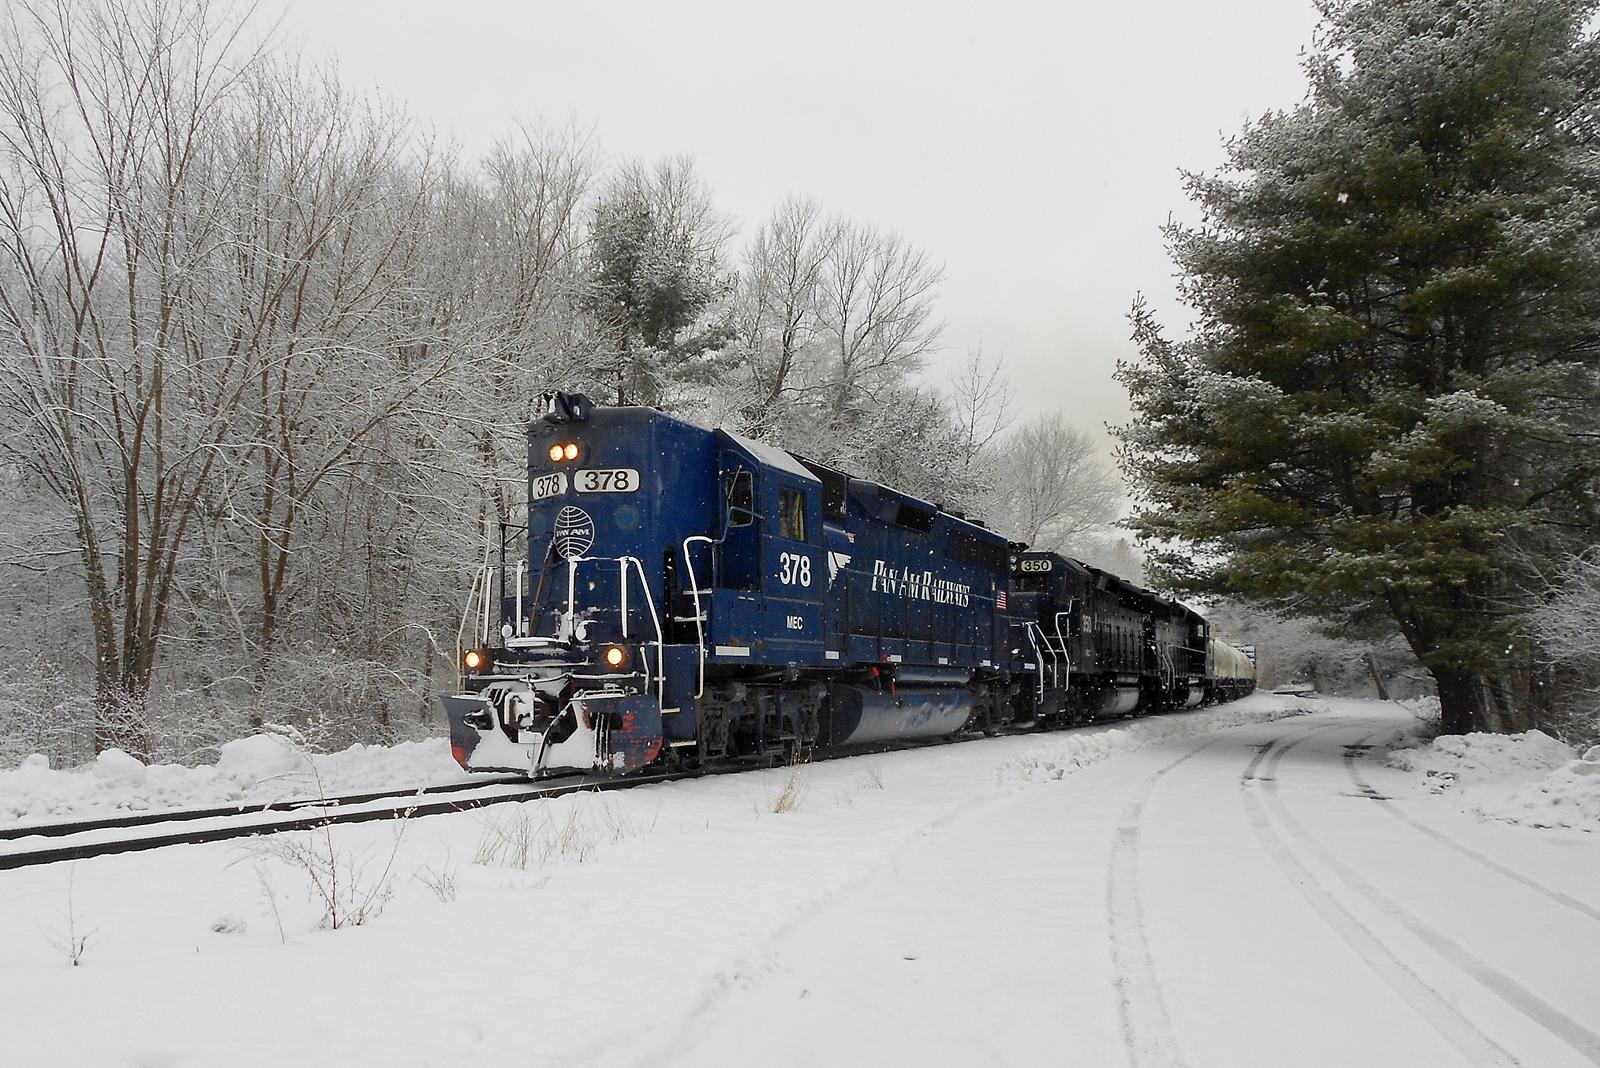 locomotive in winter part two essay